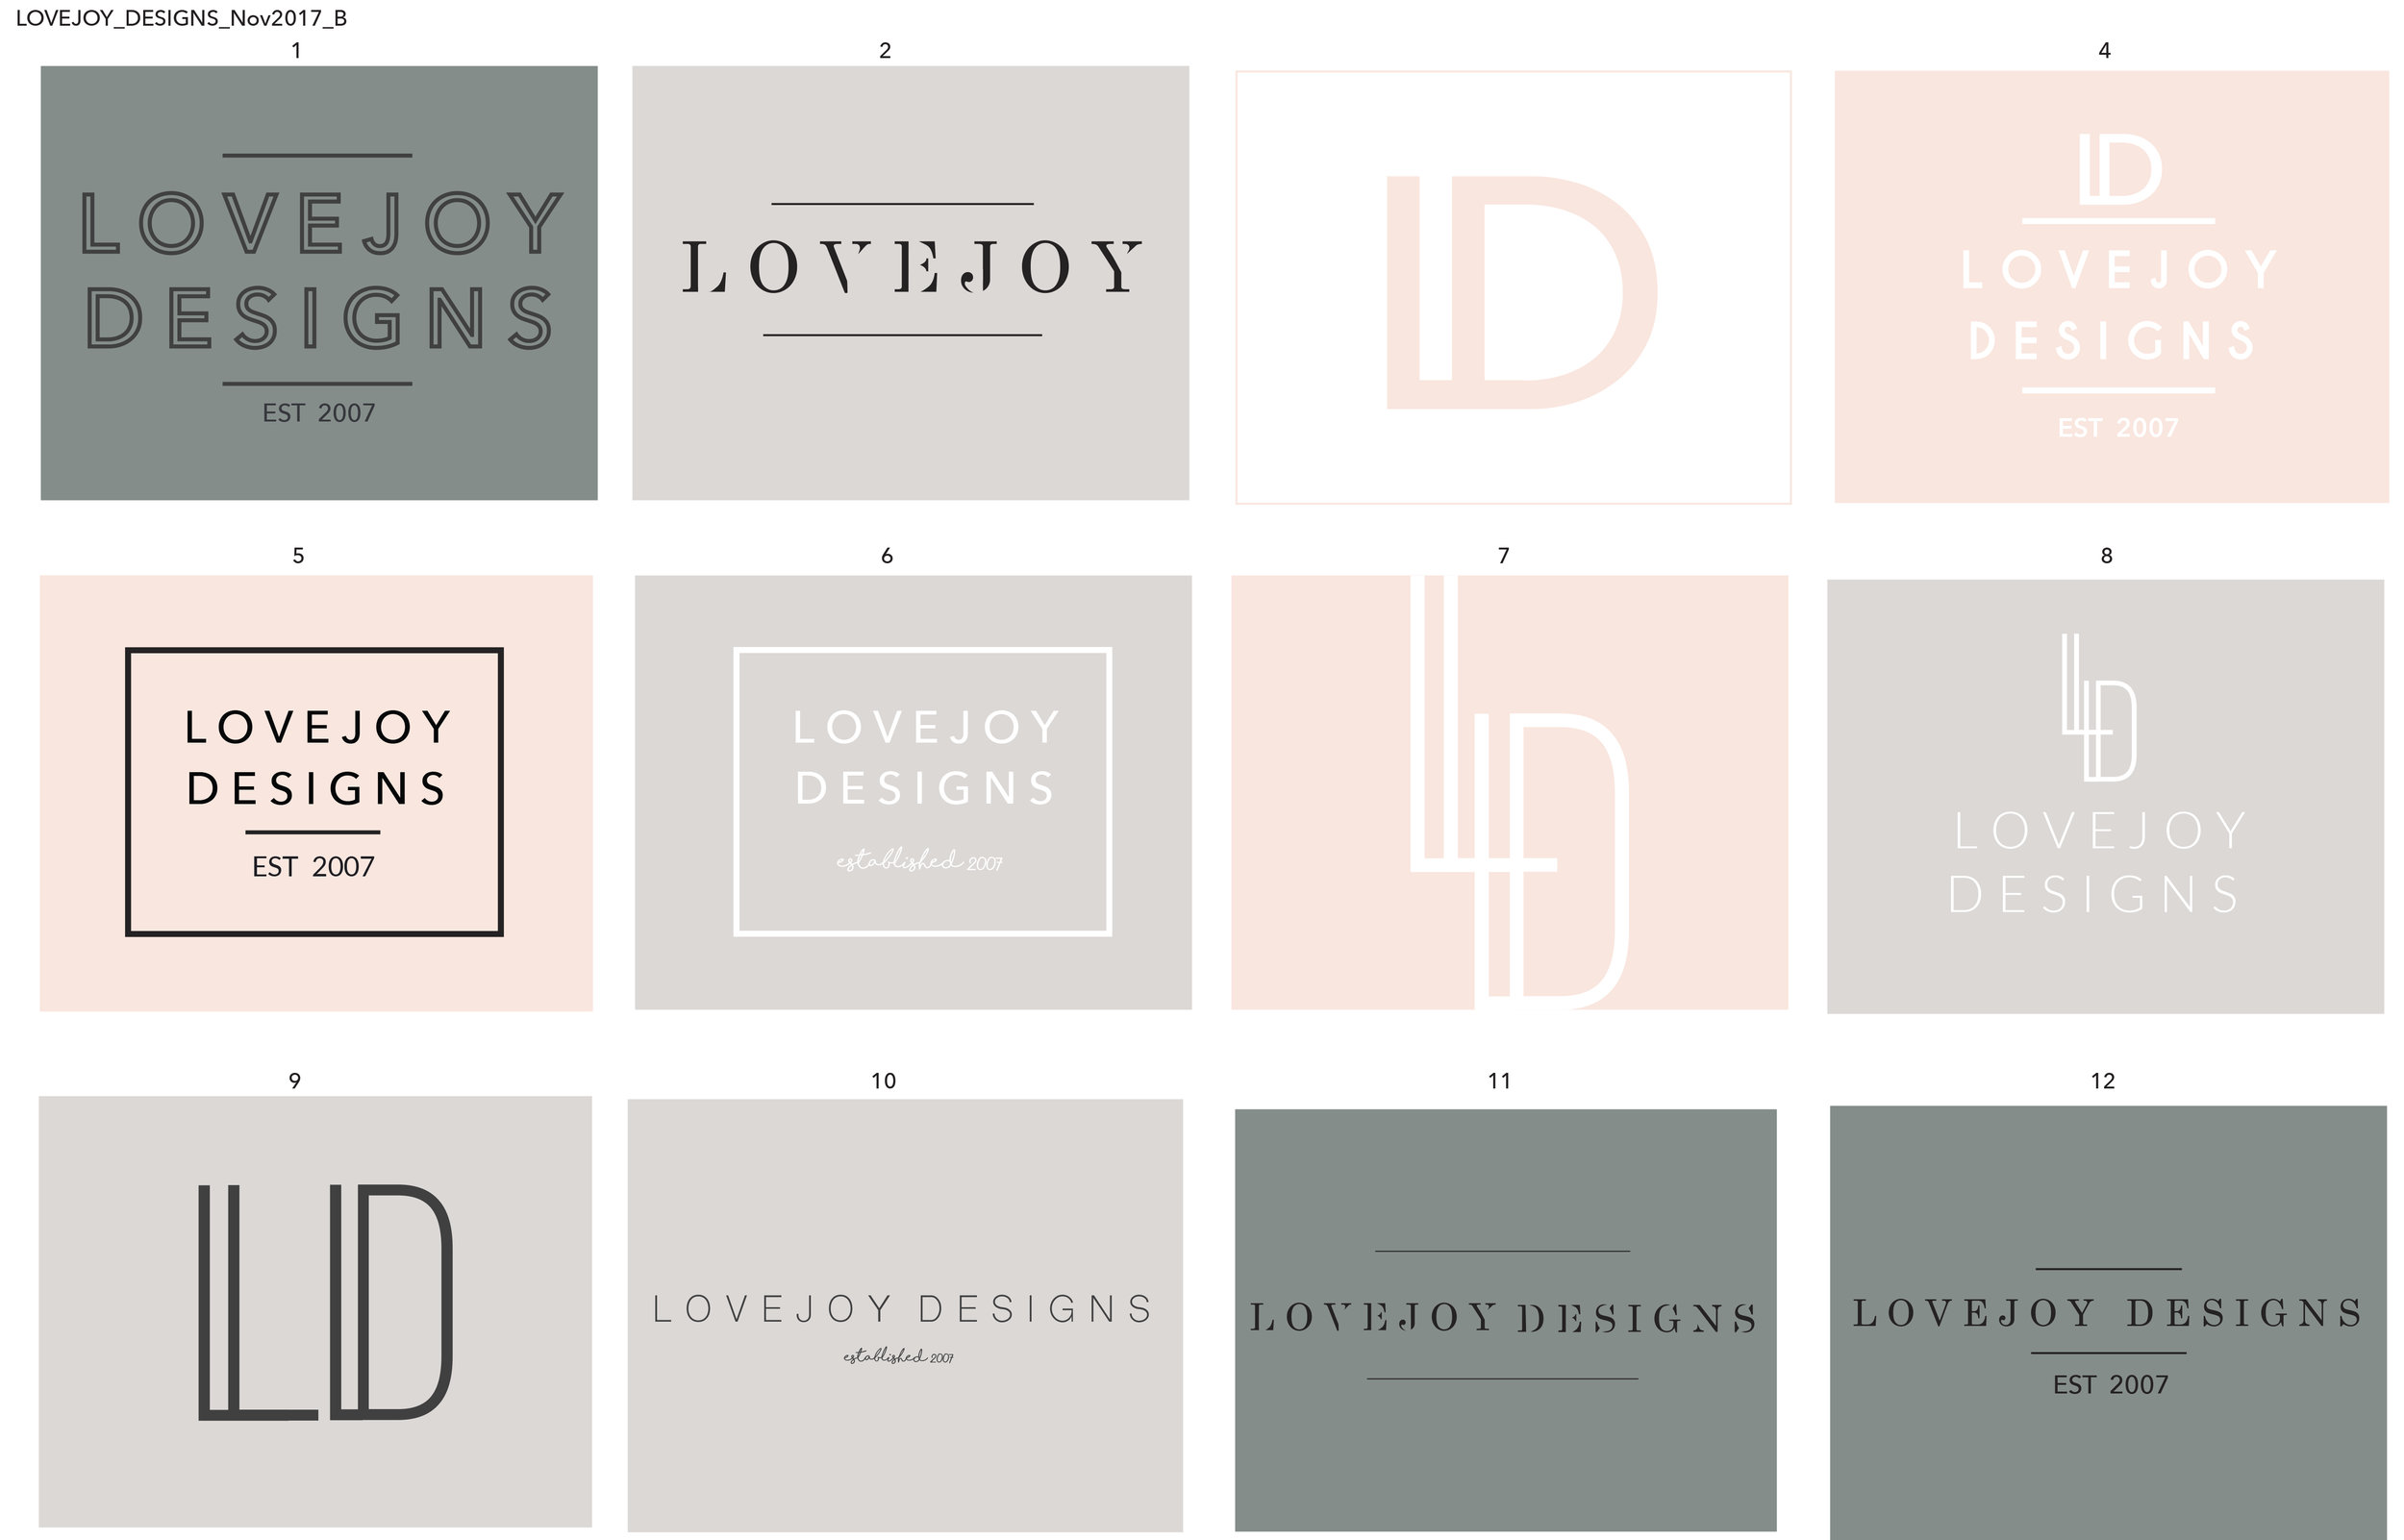 LovejoyDesigns1116_B.jpg